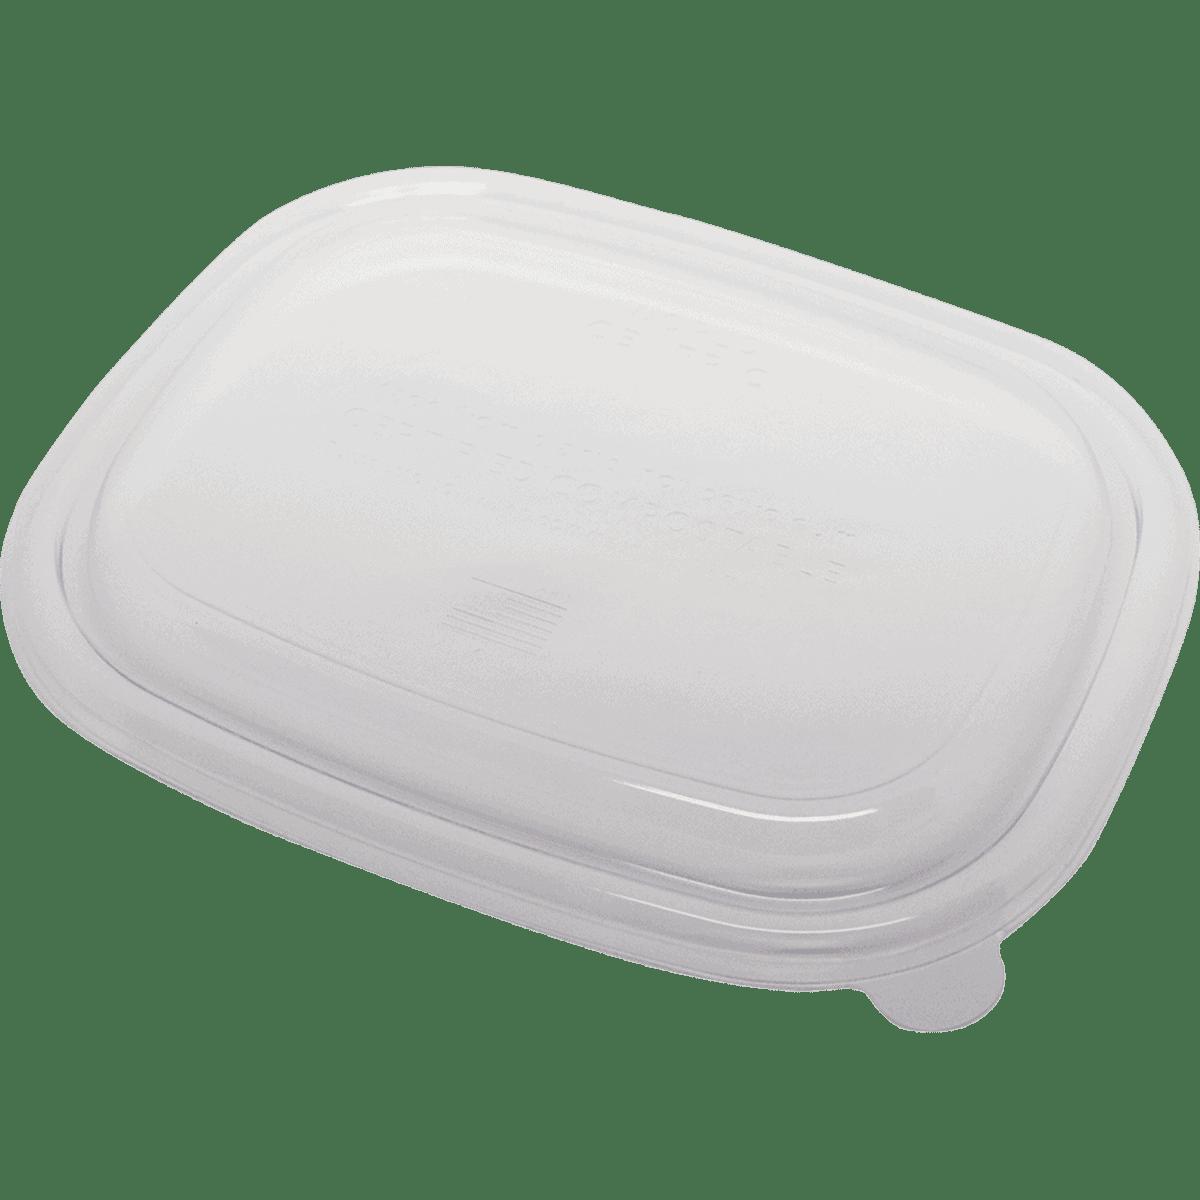 LID PLA clear lid for fiber boxes 20-48 oz